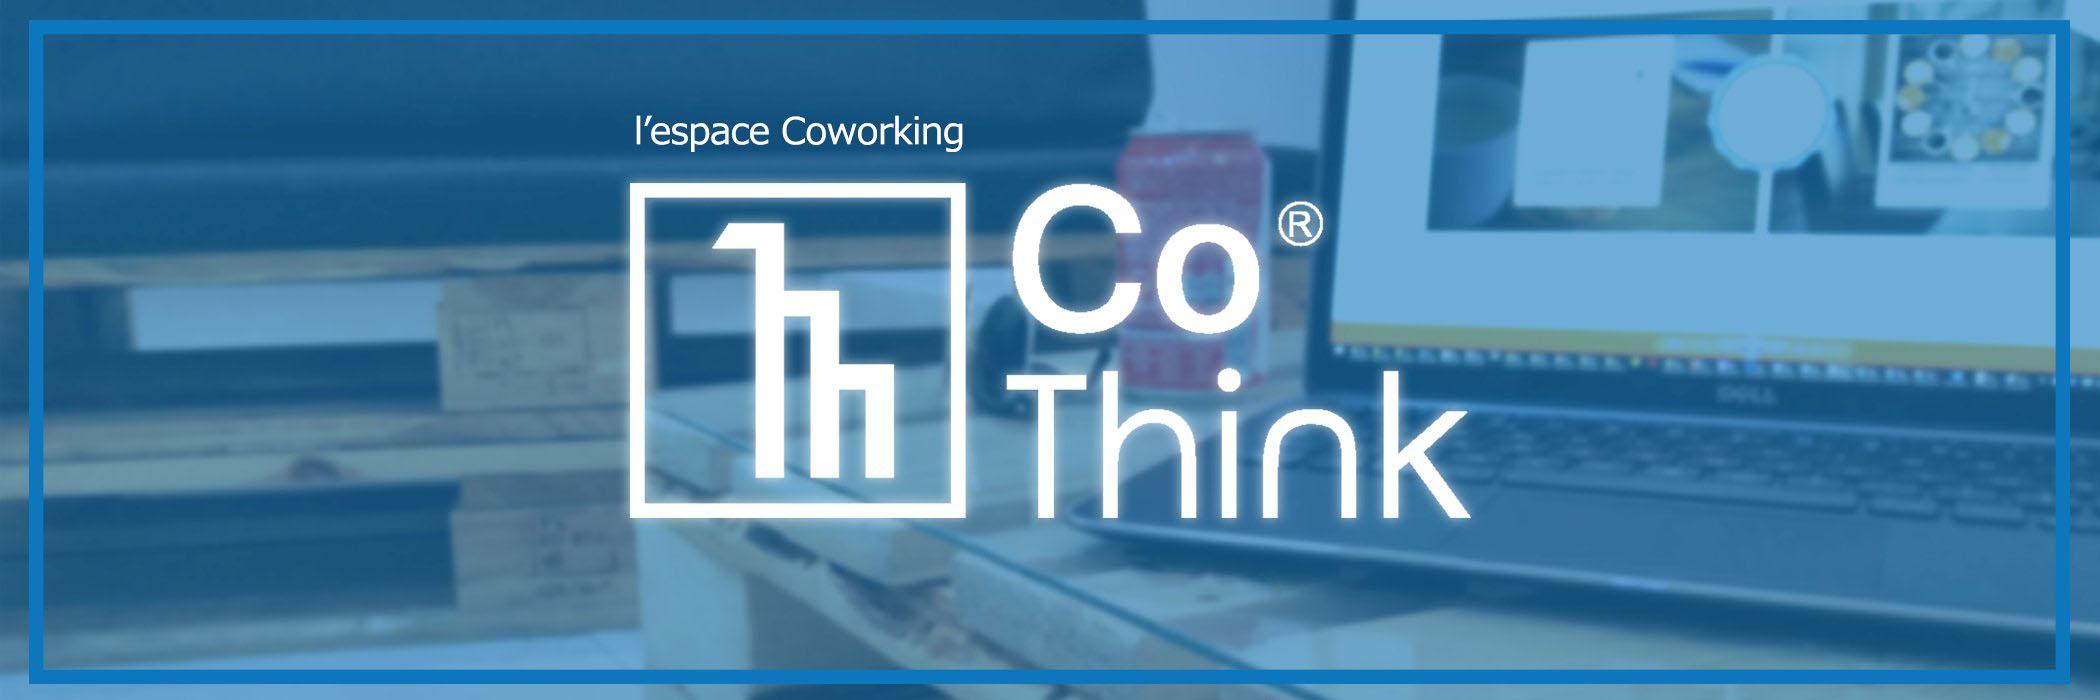 bienvenue chez espace de coworking 111-cothink